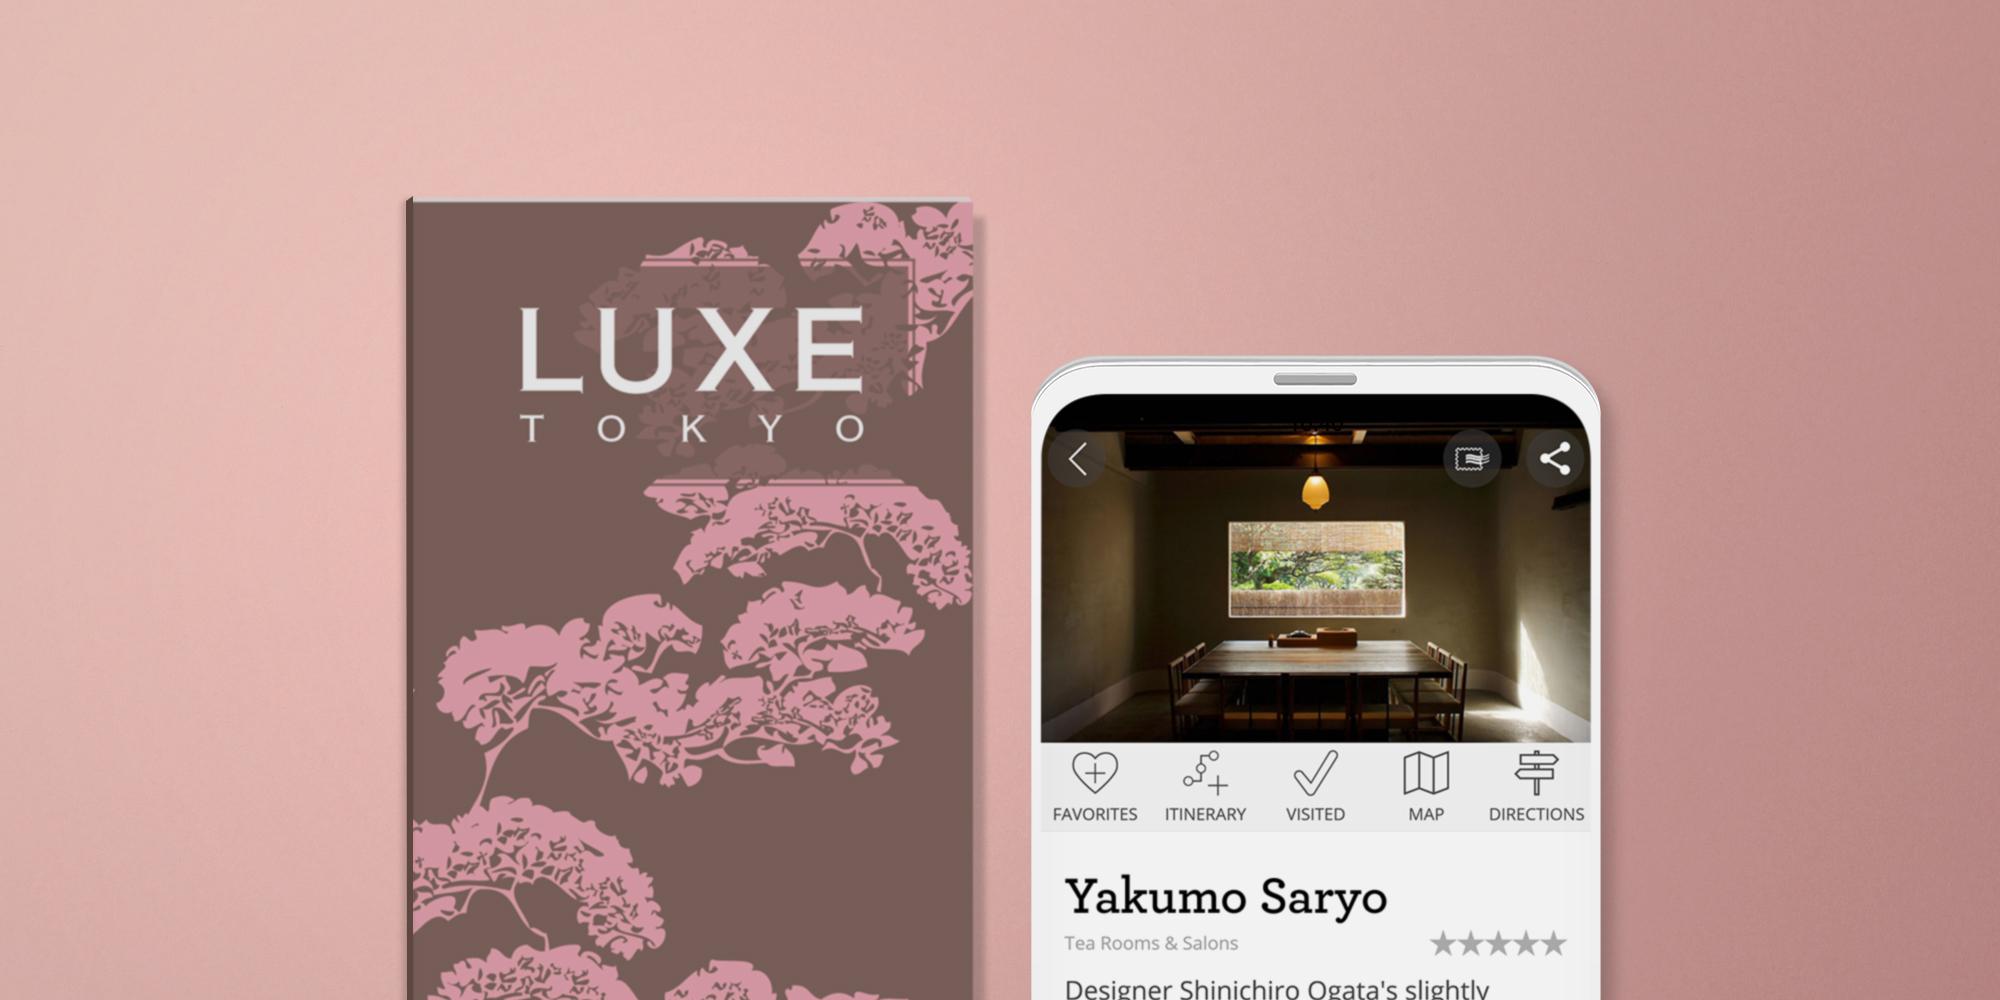 Tokyo print guide and digital guide